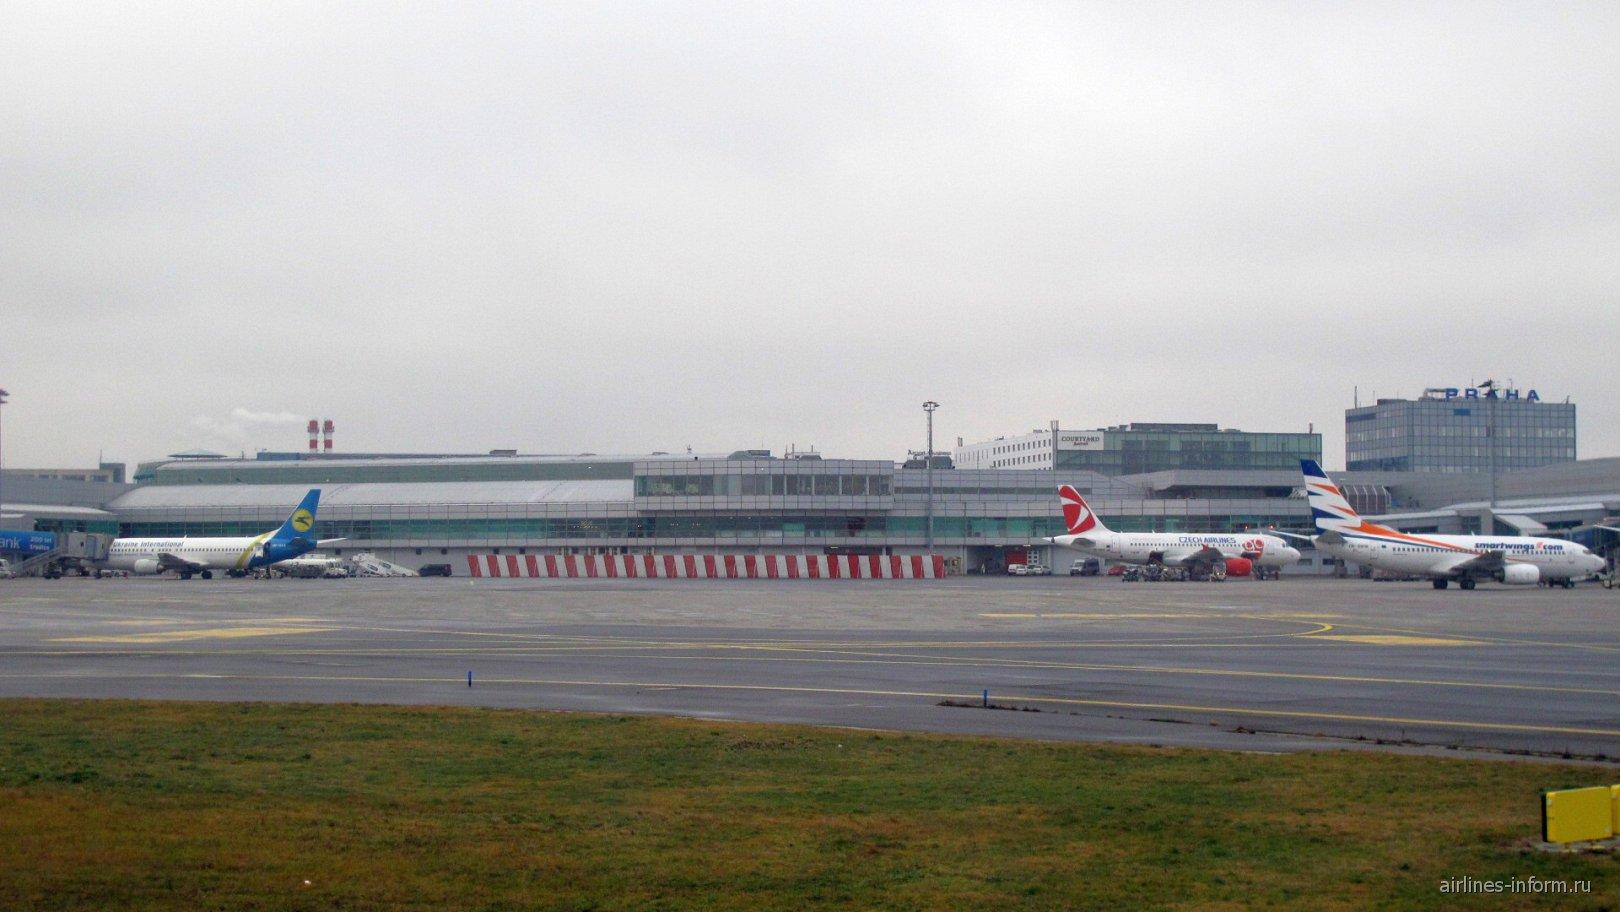 Пассажирский терминал аэропорта Прага Вацлав Гавел